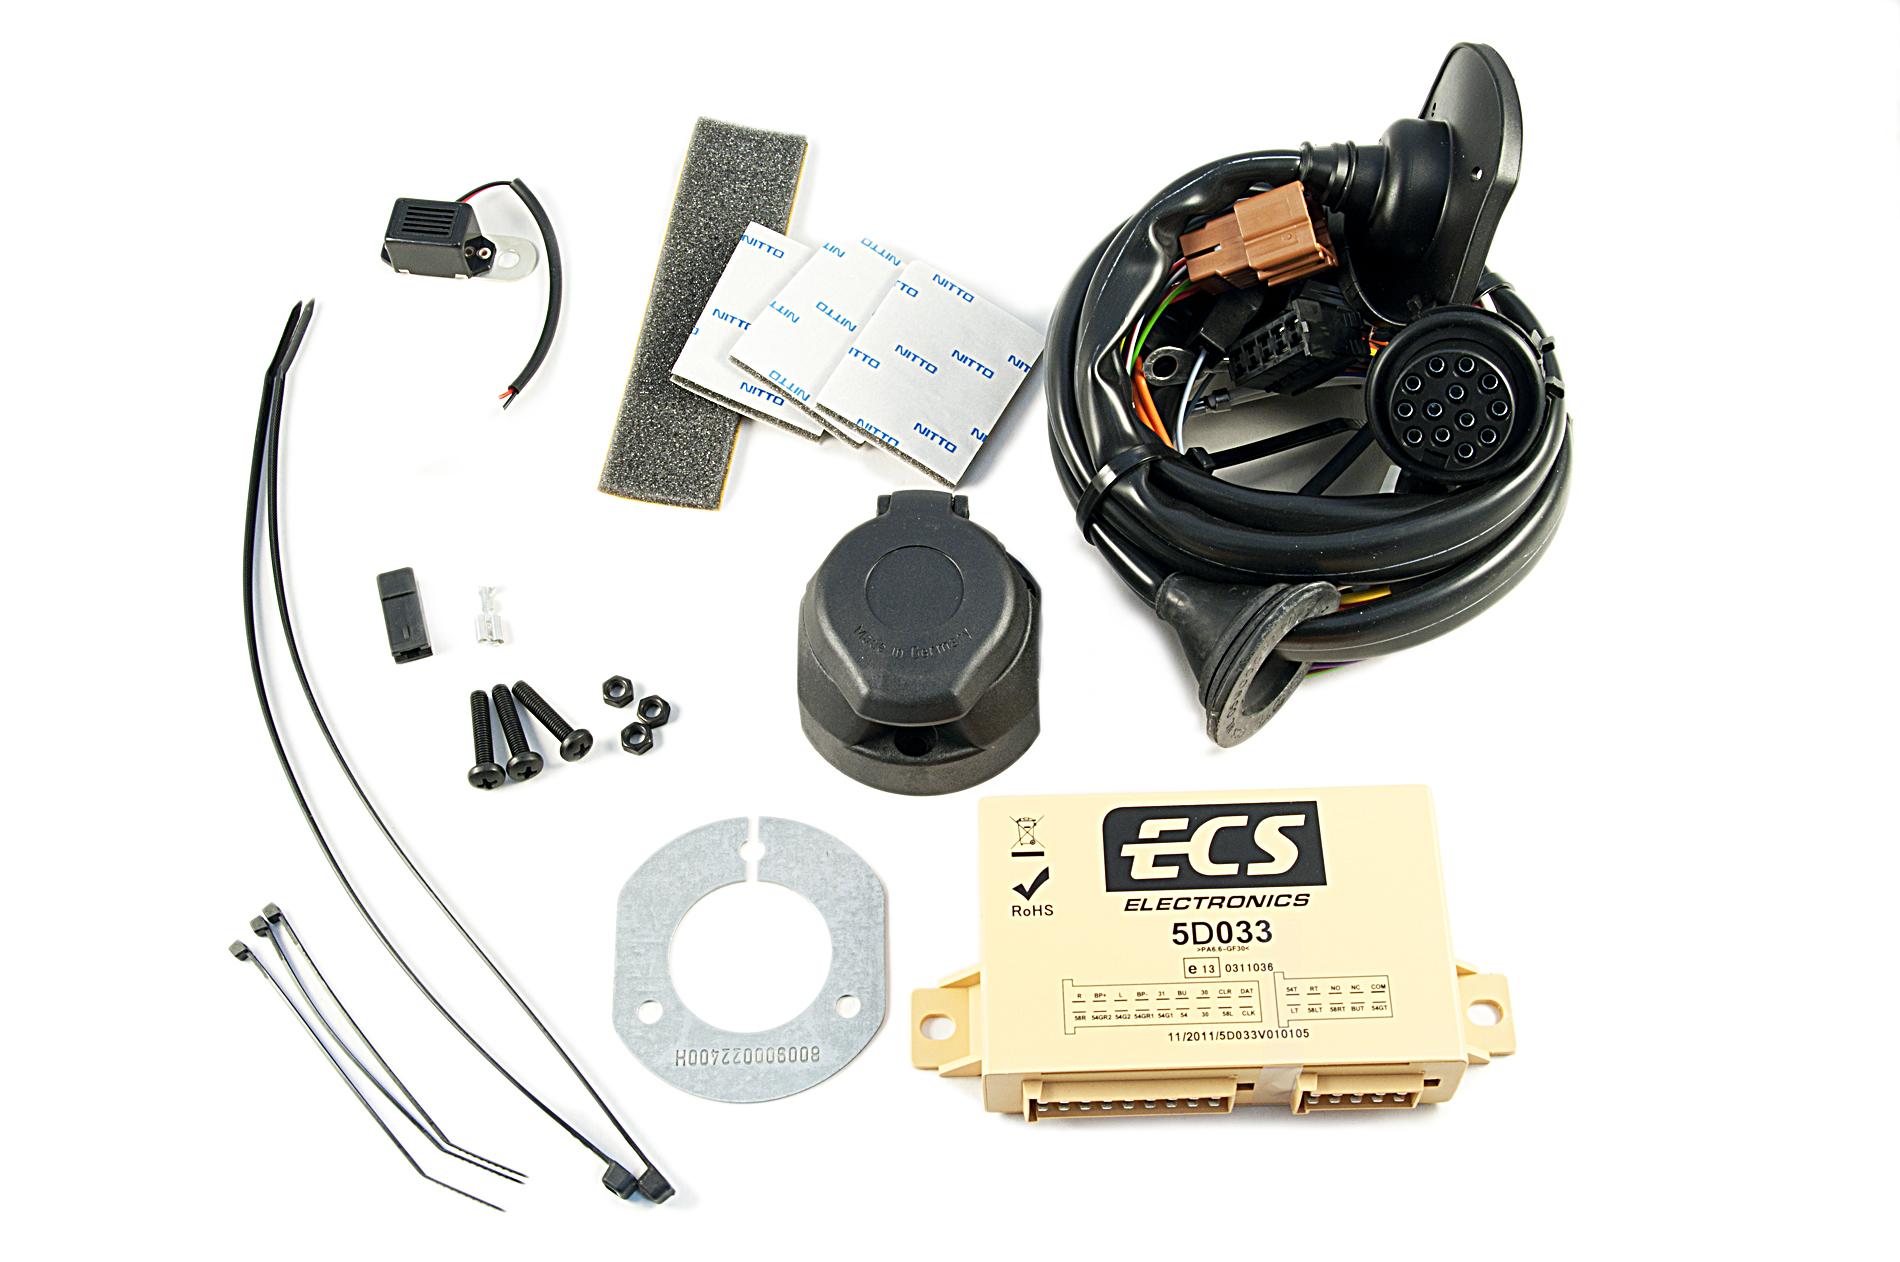 Nissan Genuine 13 Pin Electrical Kit Wiring For Towbar Hitch Diagram Ke505jg213 Ebay